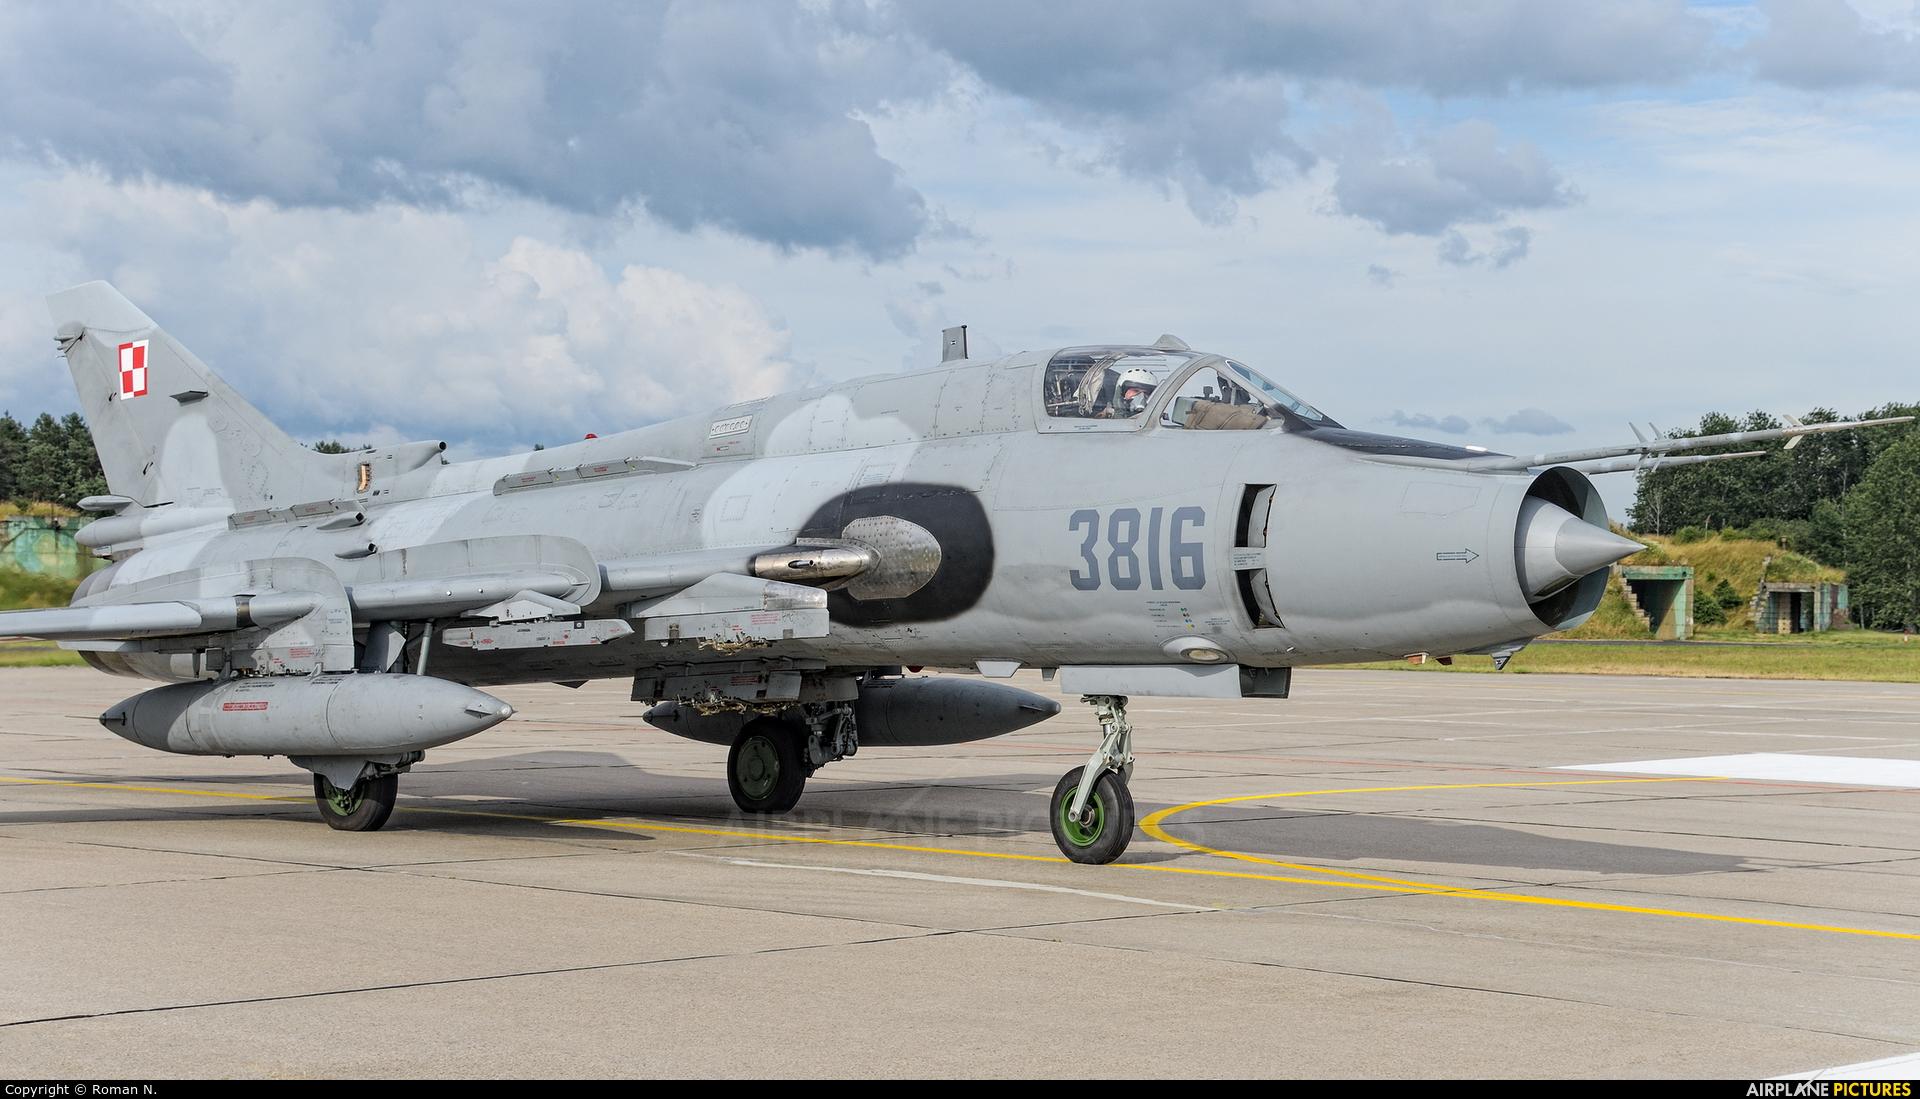 Poland - Air Force 3816 aircraft at Świdwin